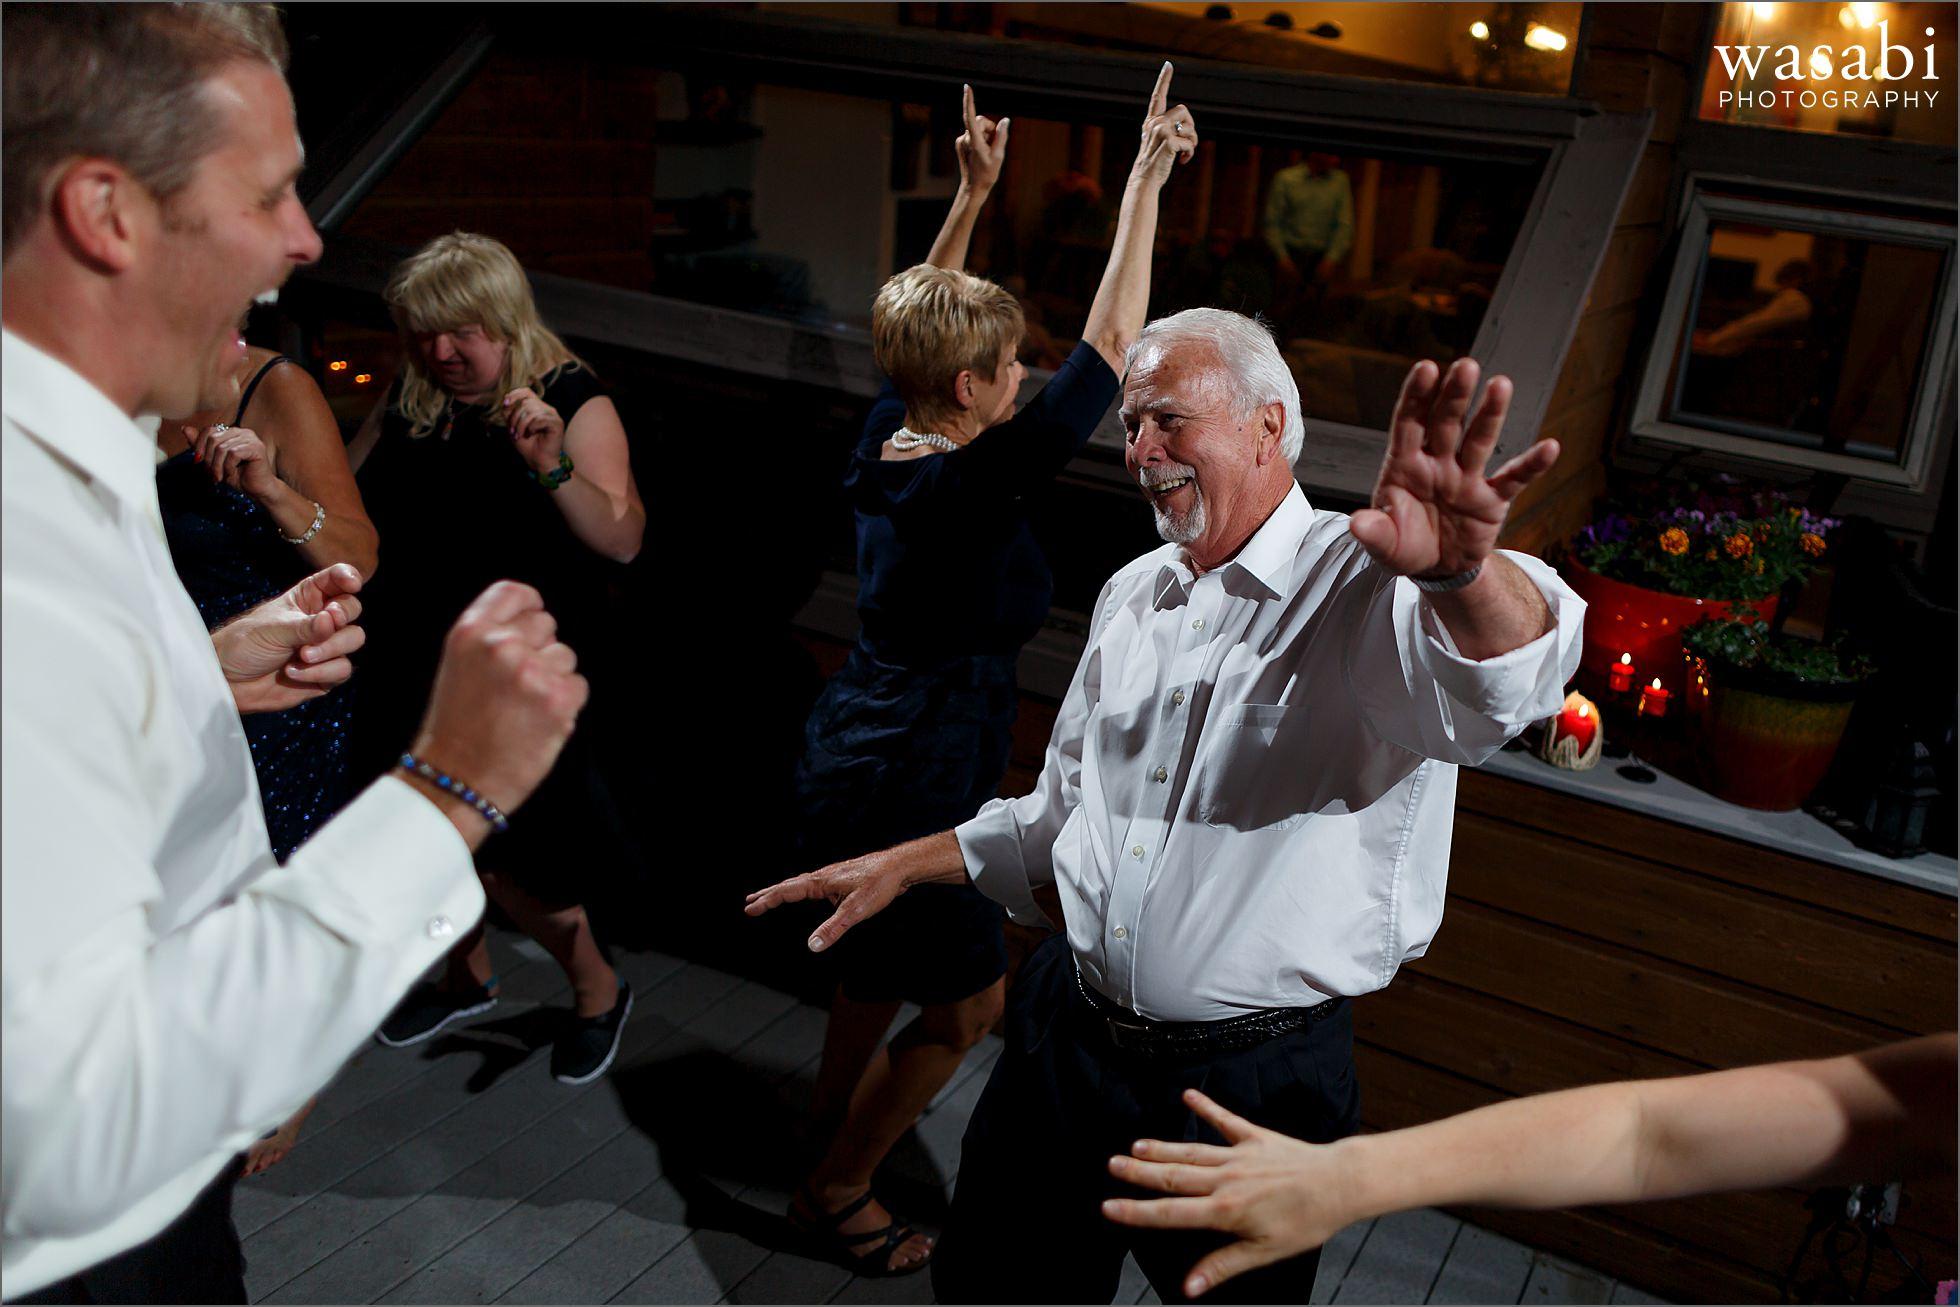 outdoor dancing photos during wedding reception at a private estate on Lookout Mountain in Golden Colorado